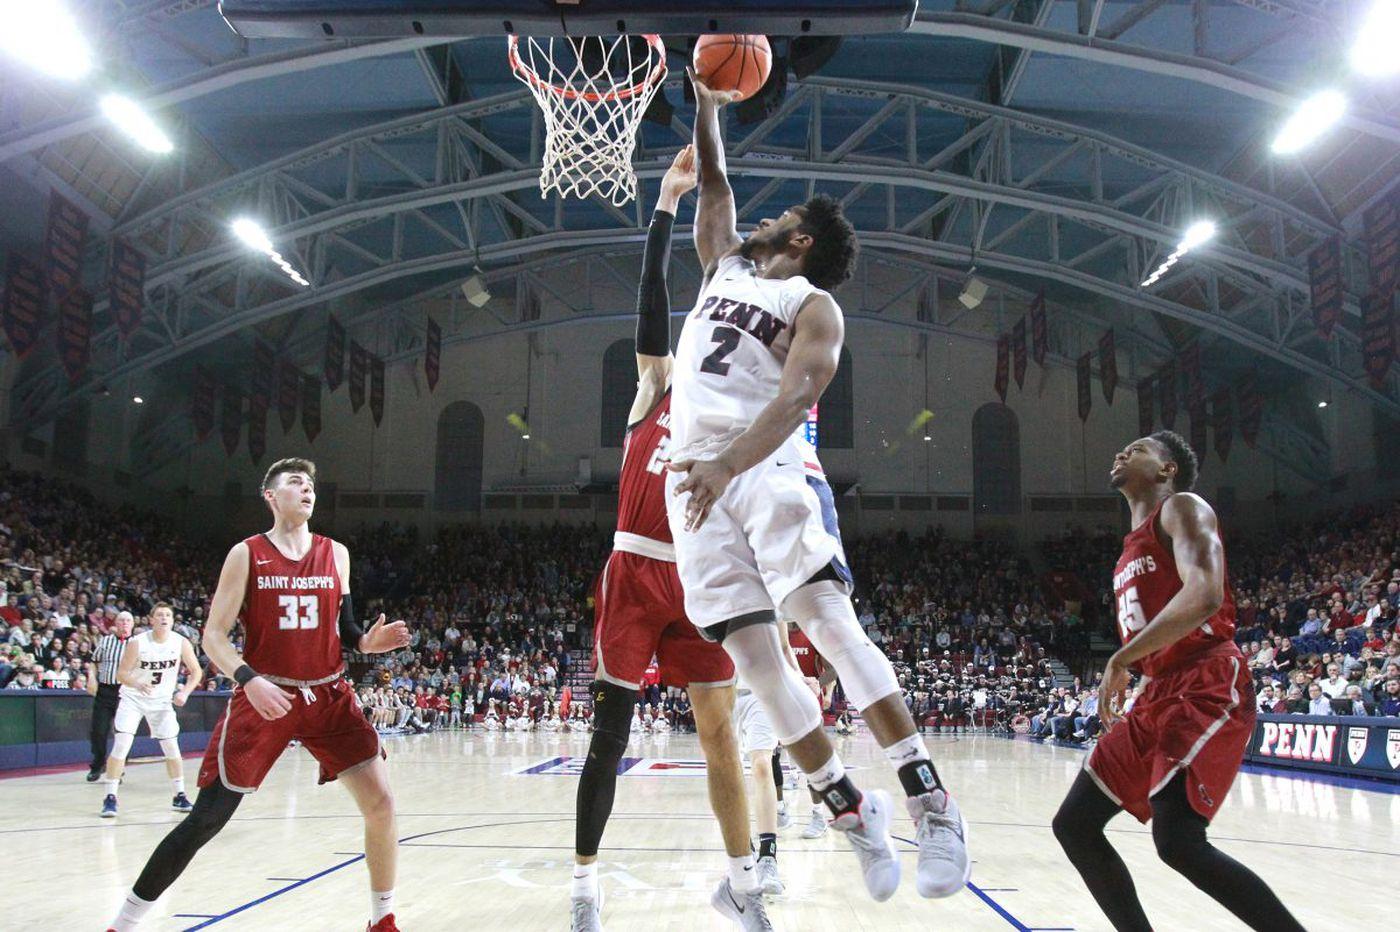 Penn shuts down St. Joseph's for a Big Five win